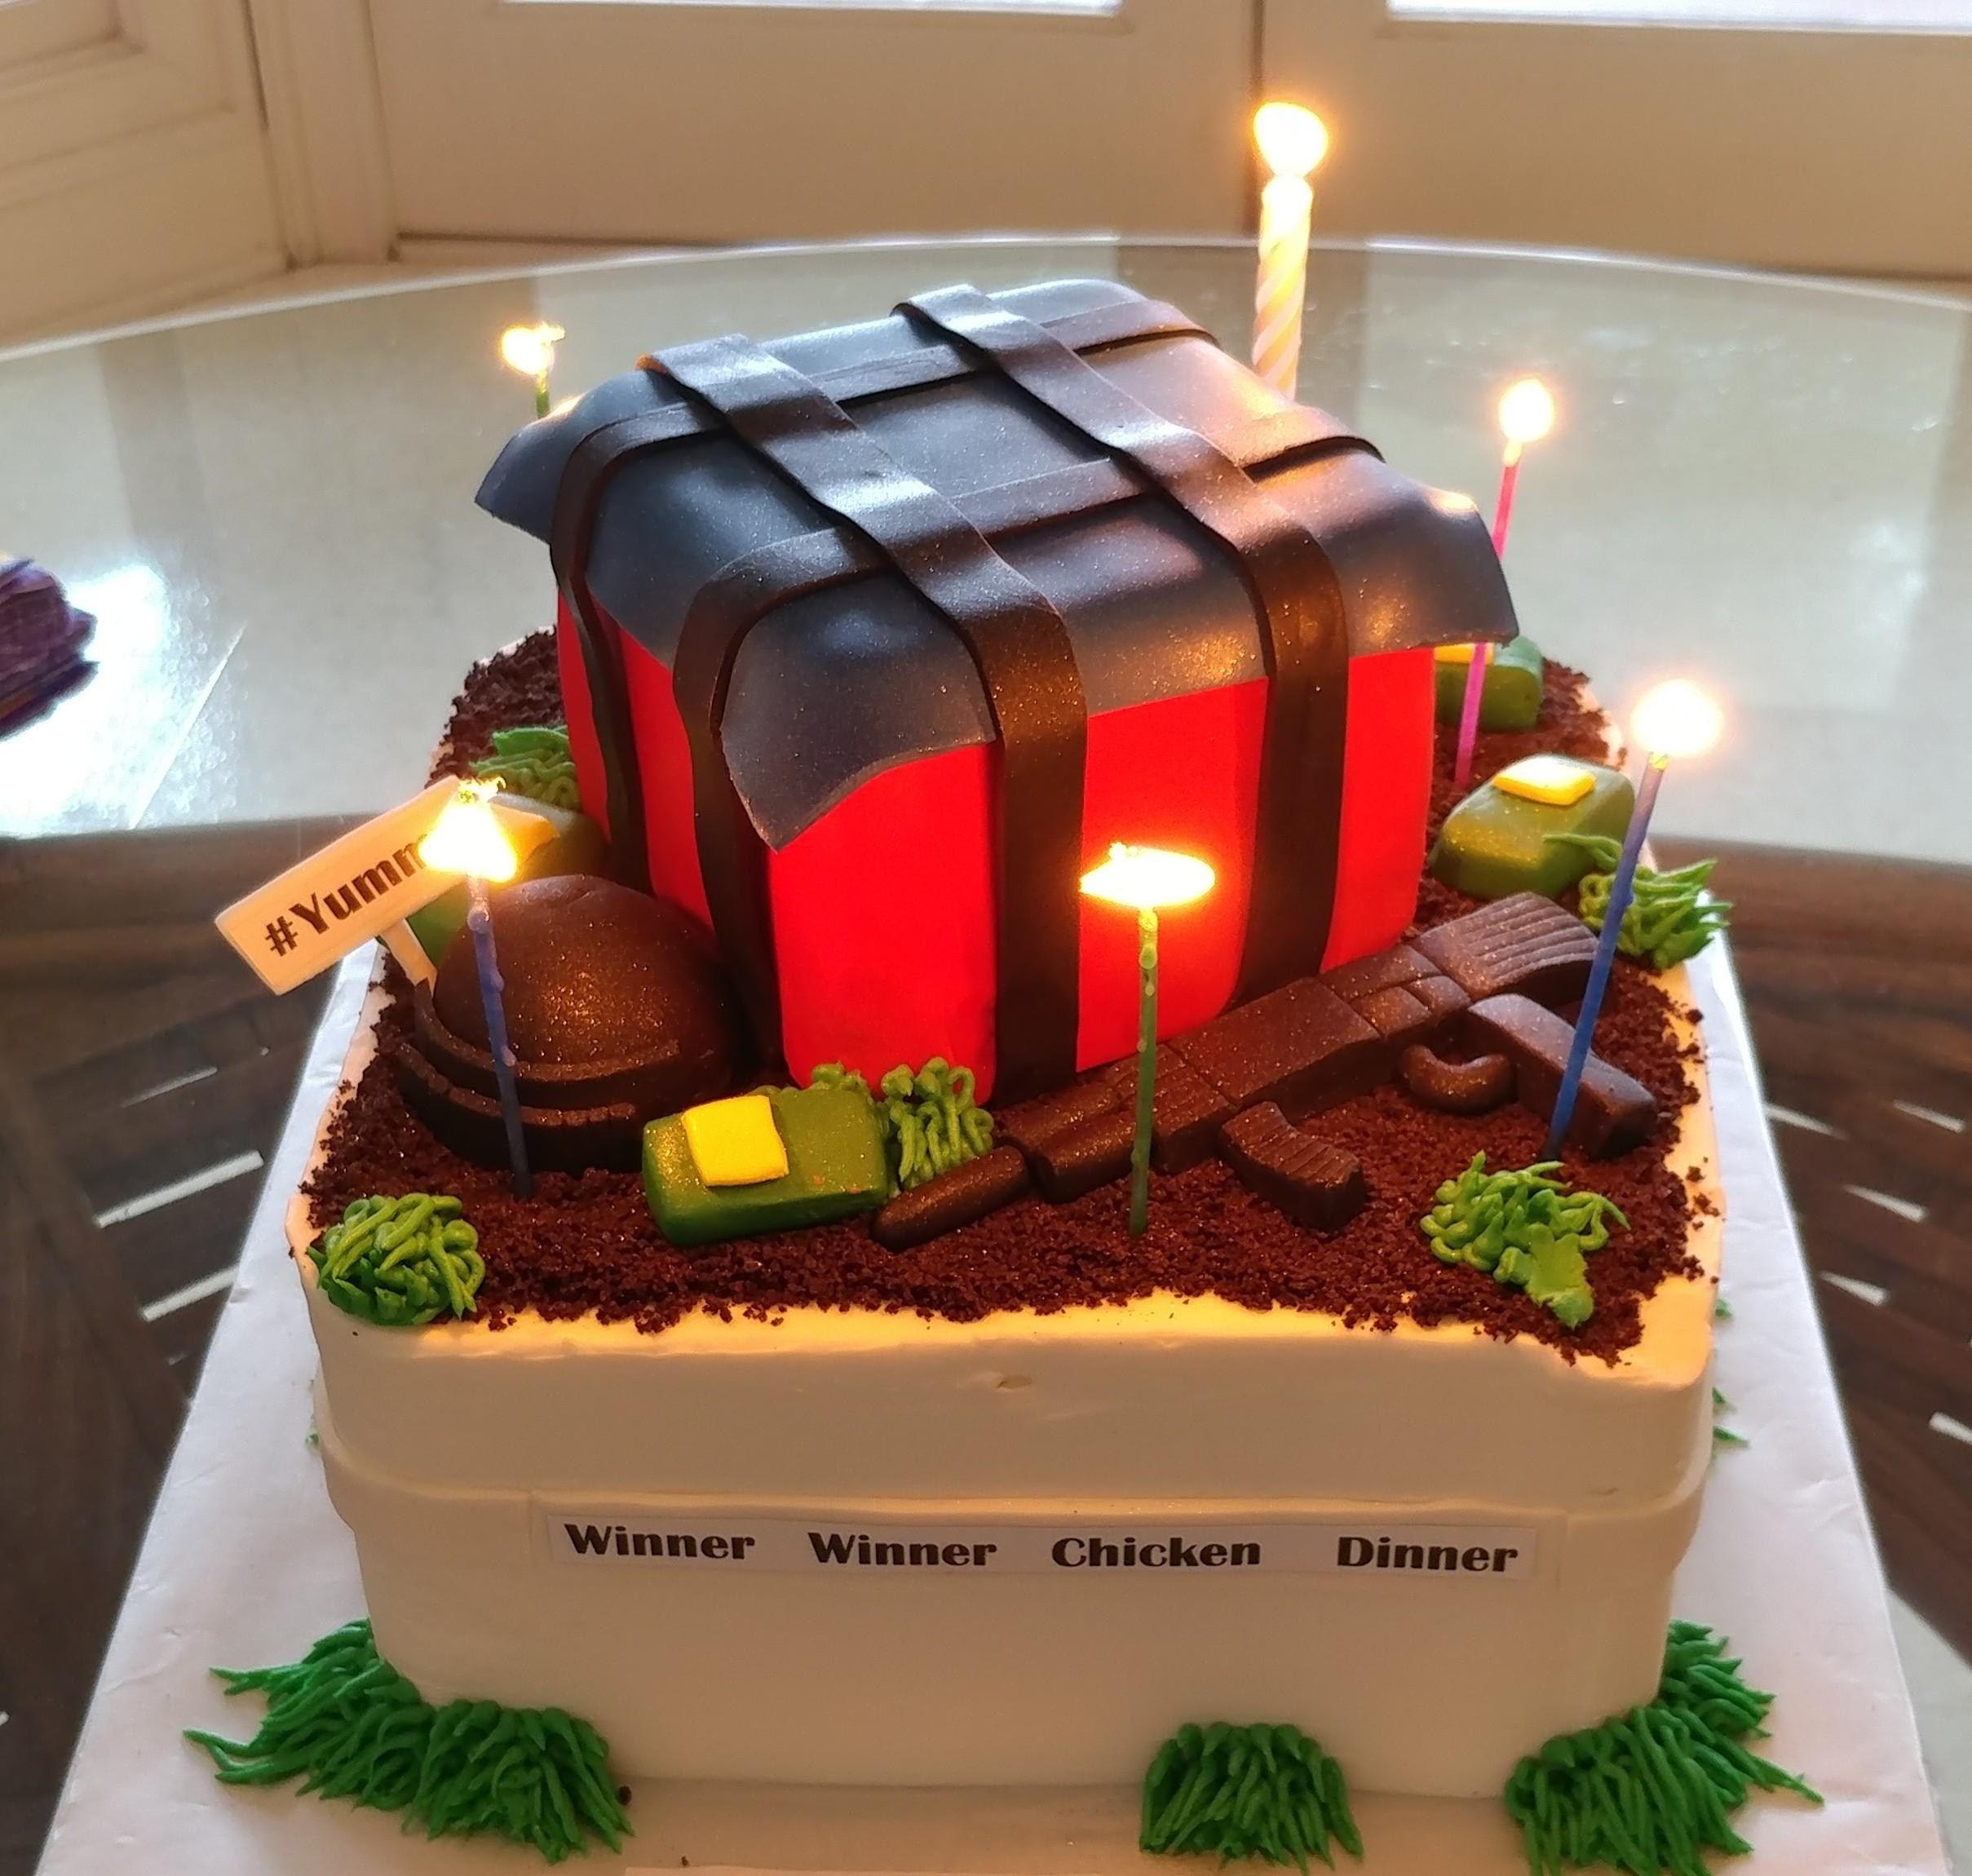 Wondrous 25 Amazing Photo Of Best Birthday Cake Ever Cool Birthday Cakes Funny Birthday Cards Online Elaedamsfinfo